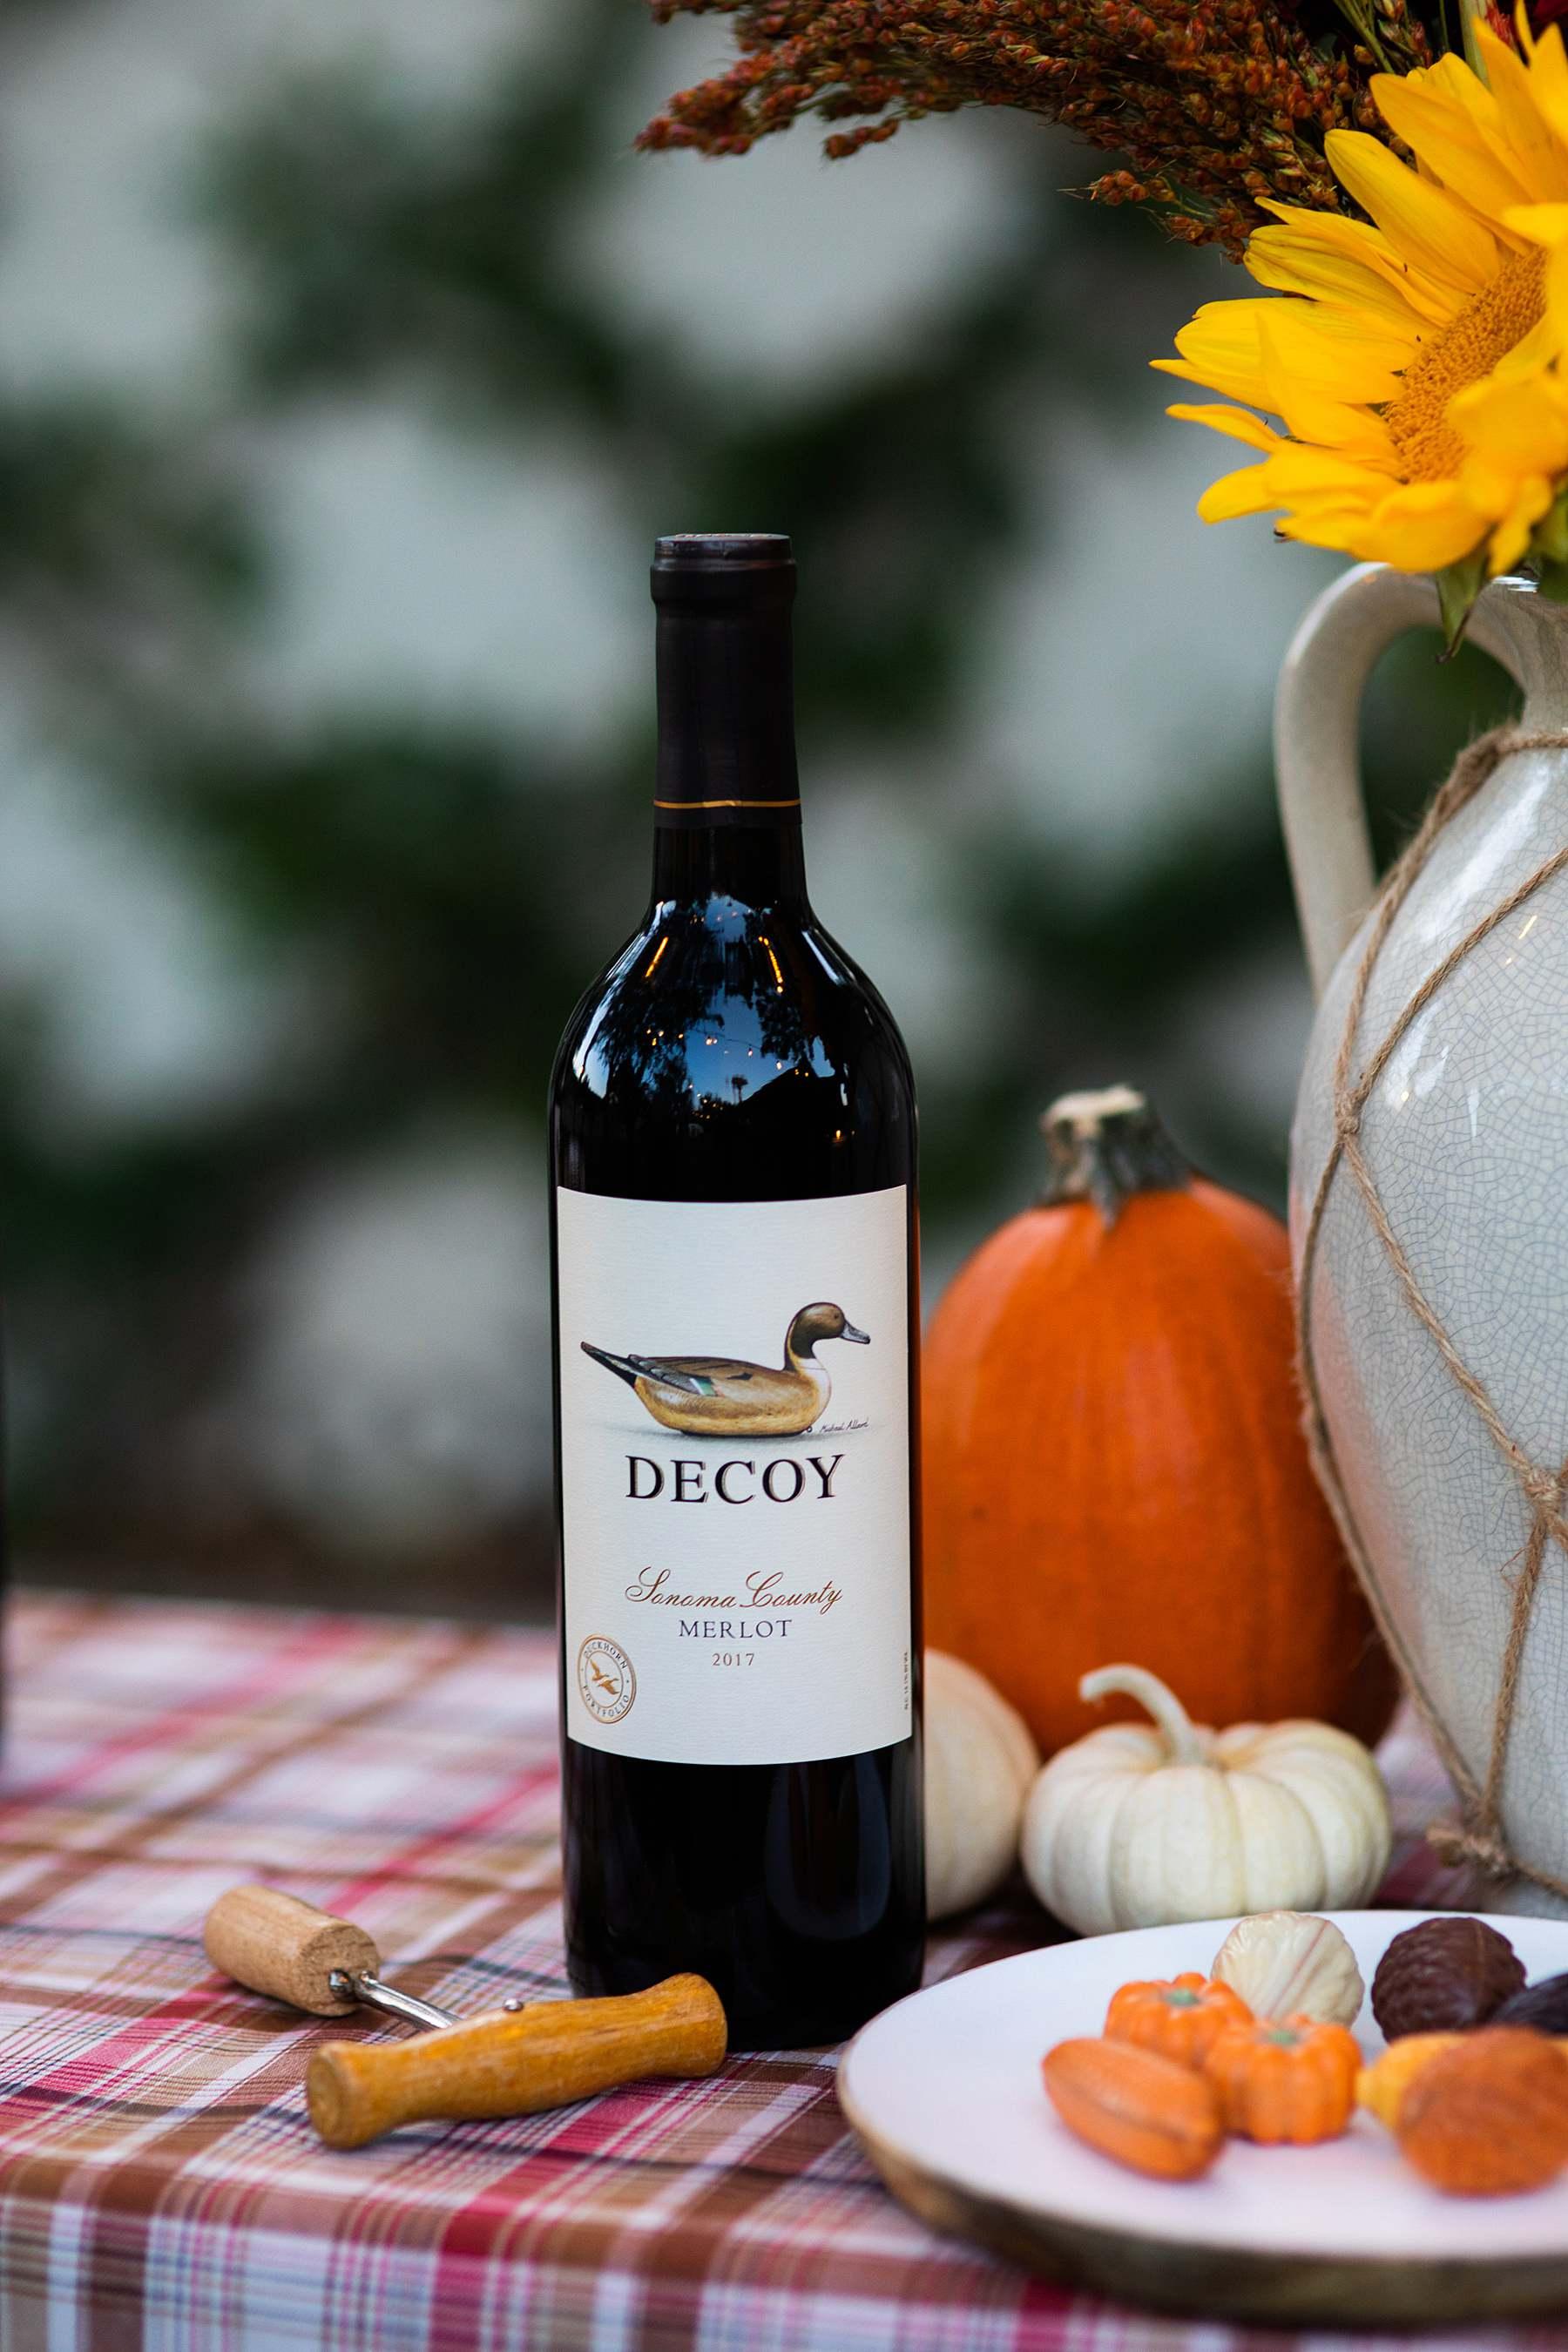 decoy wine on table Friendsgiving idea outdoor tablescape party